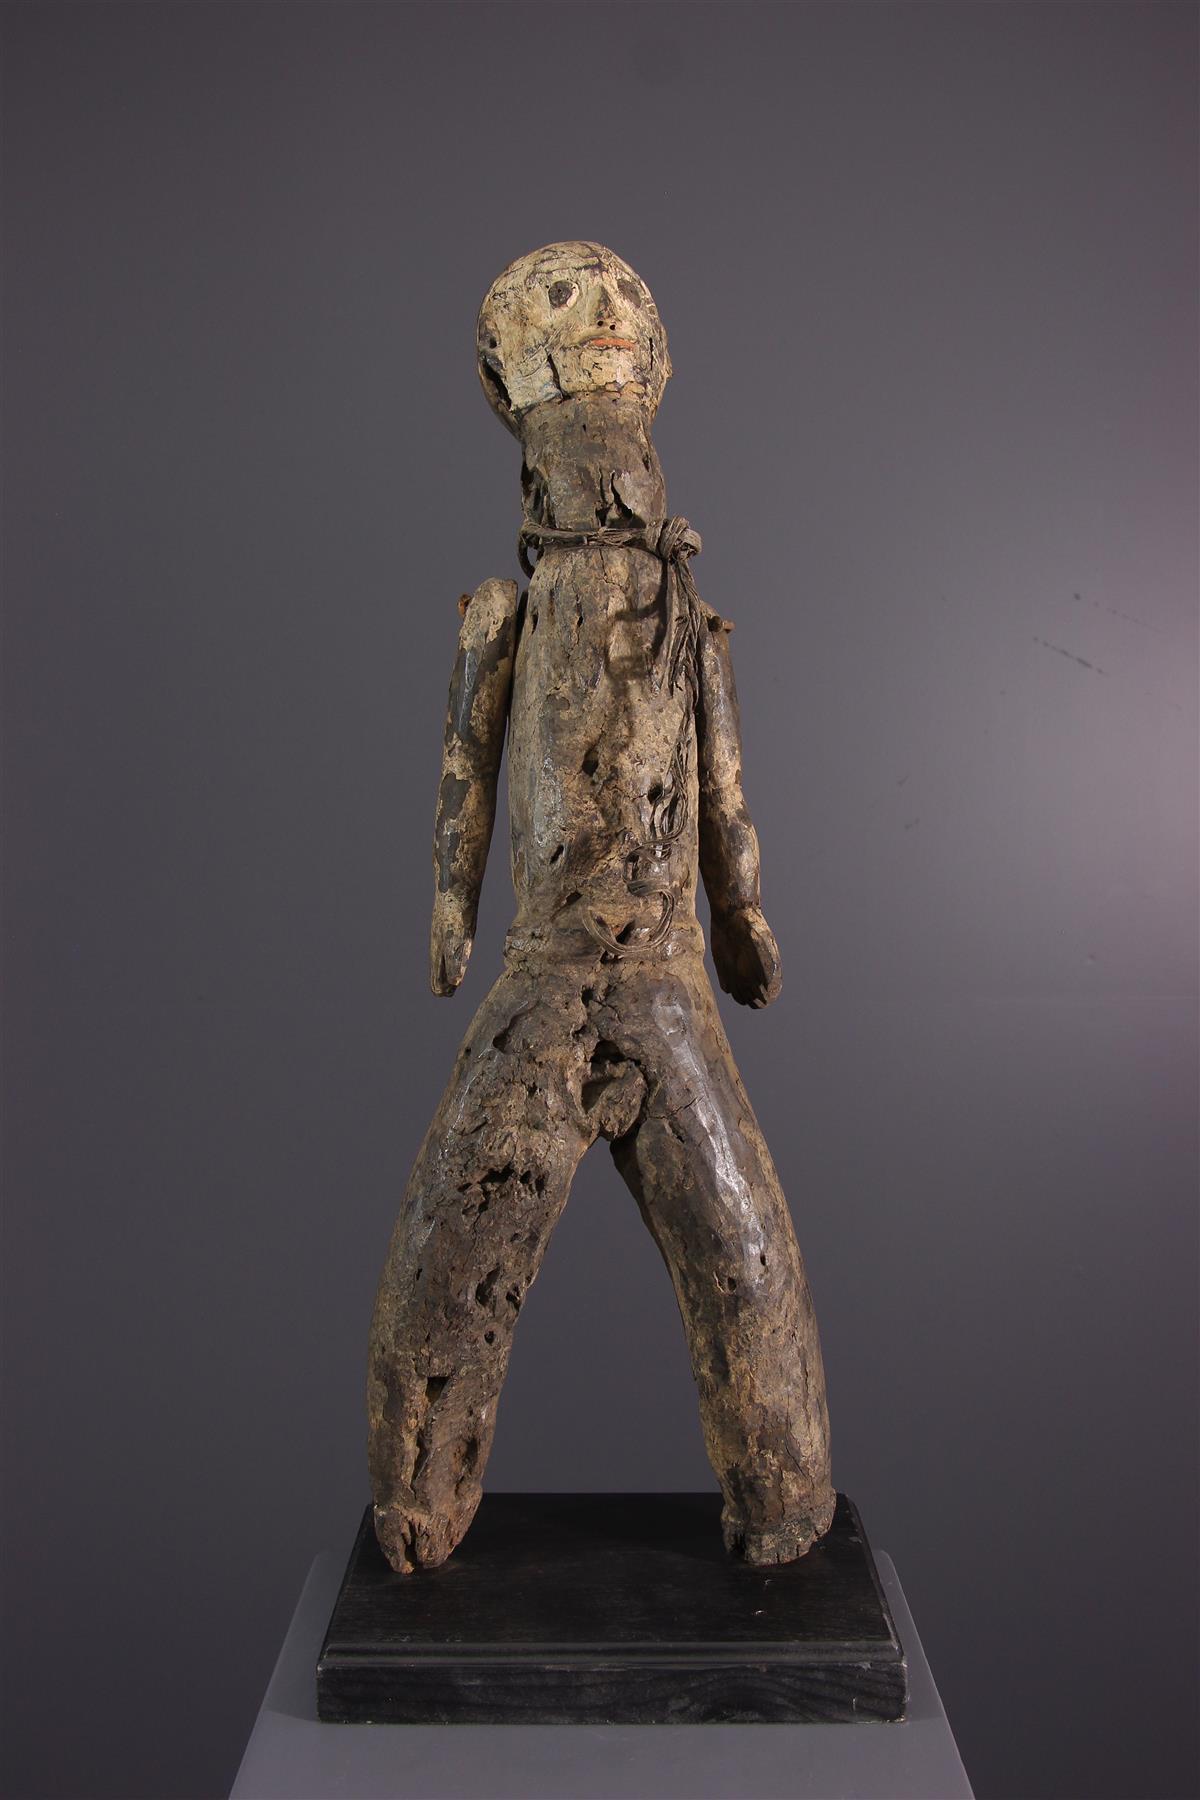 Tiv statue - Tribal art